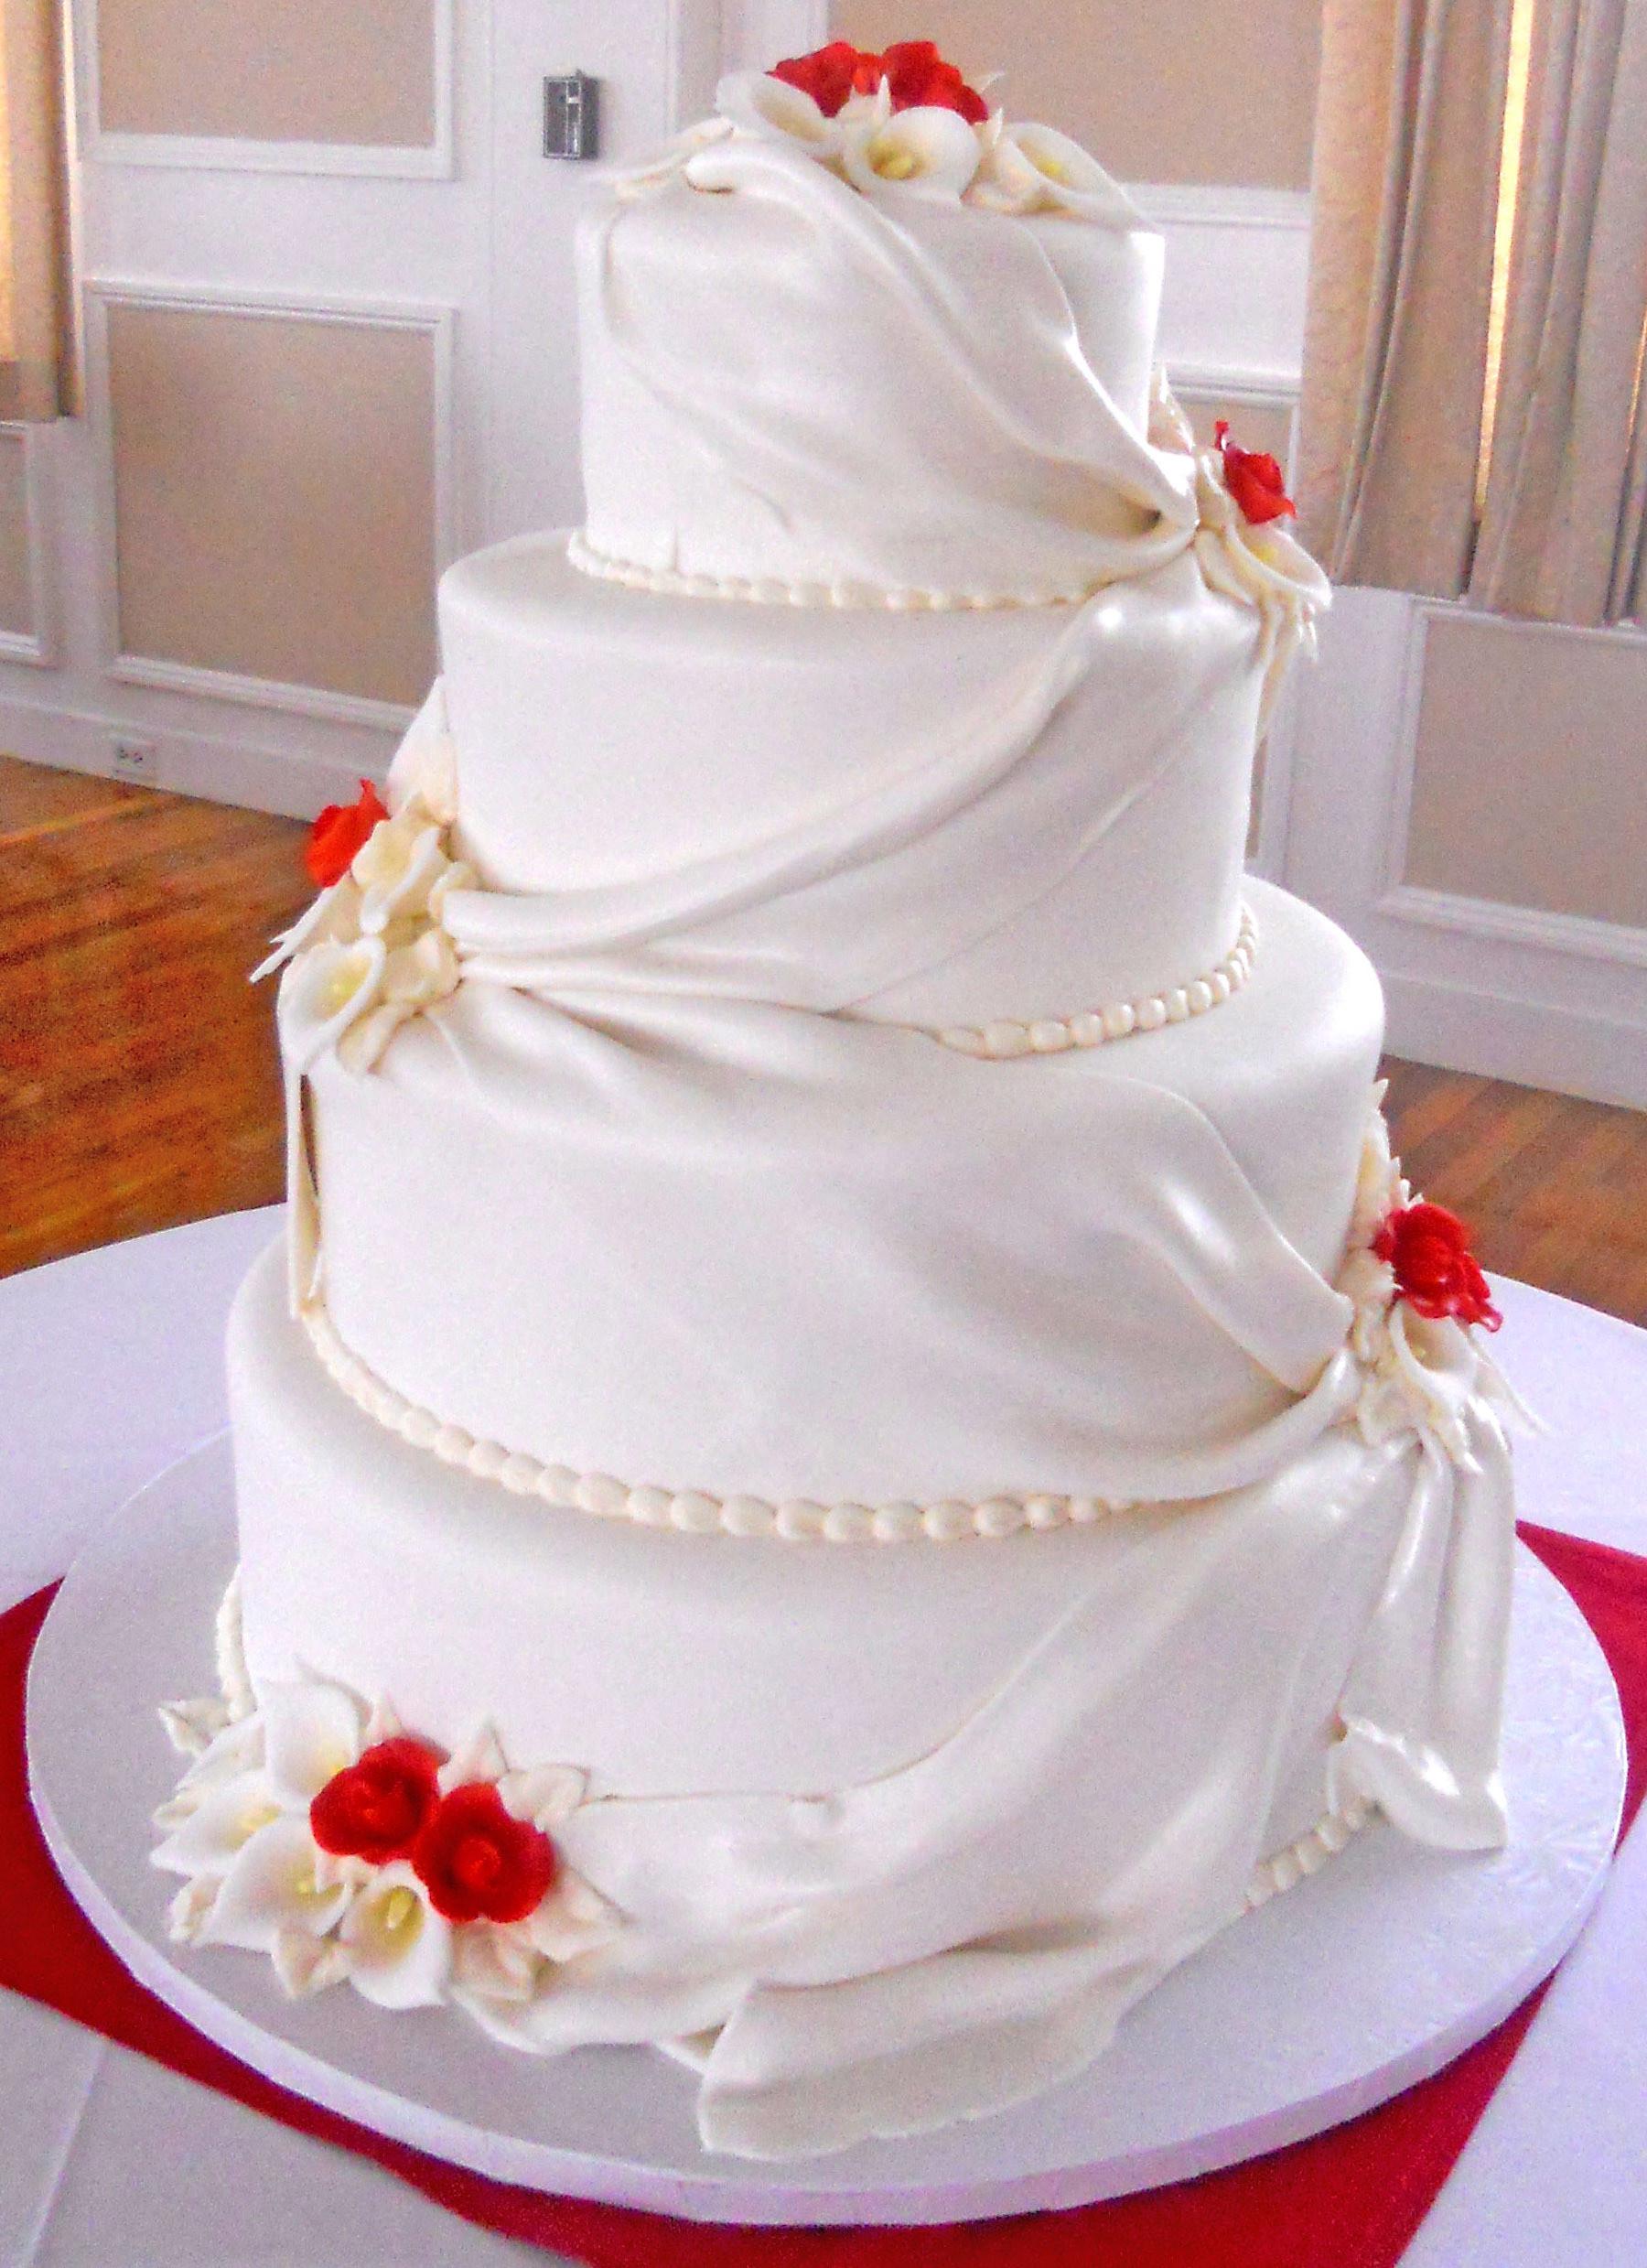 Wedding Cakes Pics  Wedding Cakes Idea Wallpapers